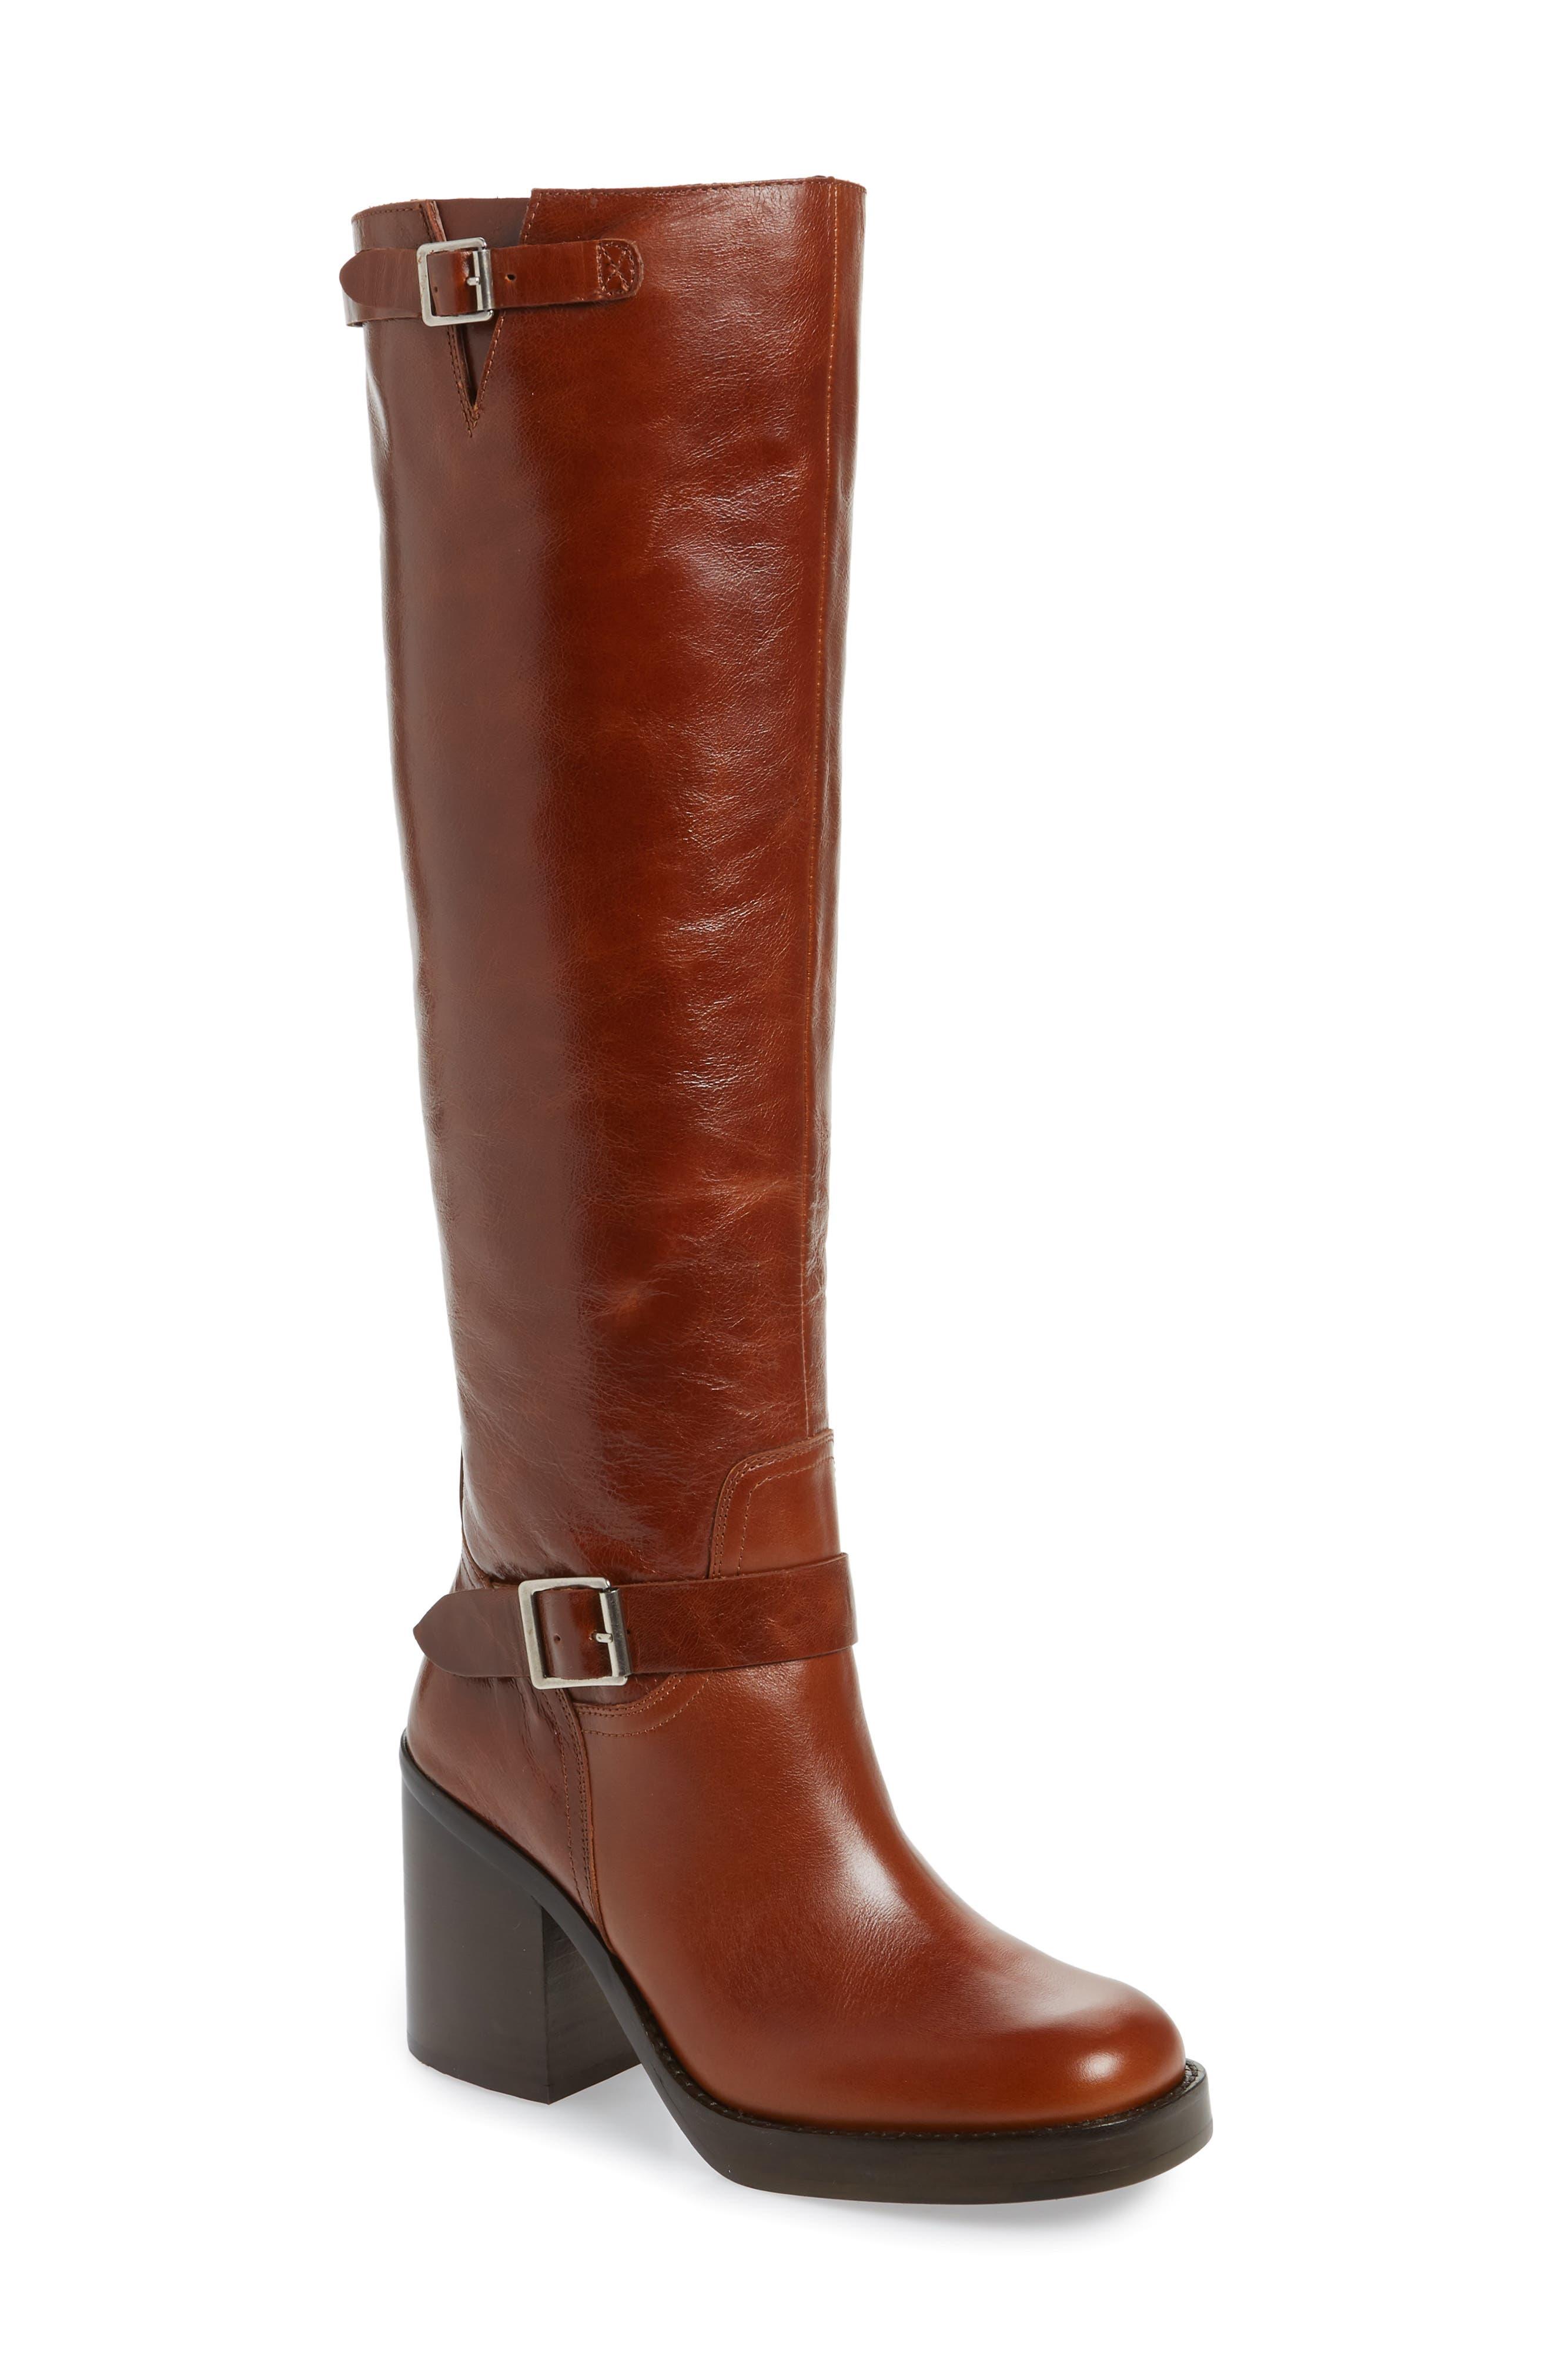 Jeffrey Campbell Lottie-2 Knee High Boot, Brown